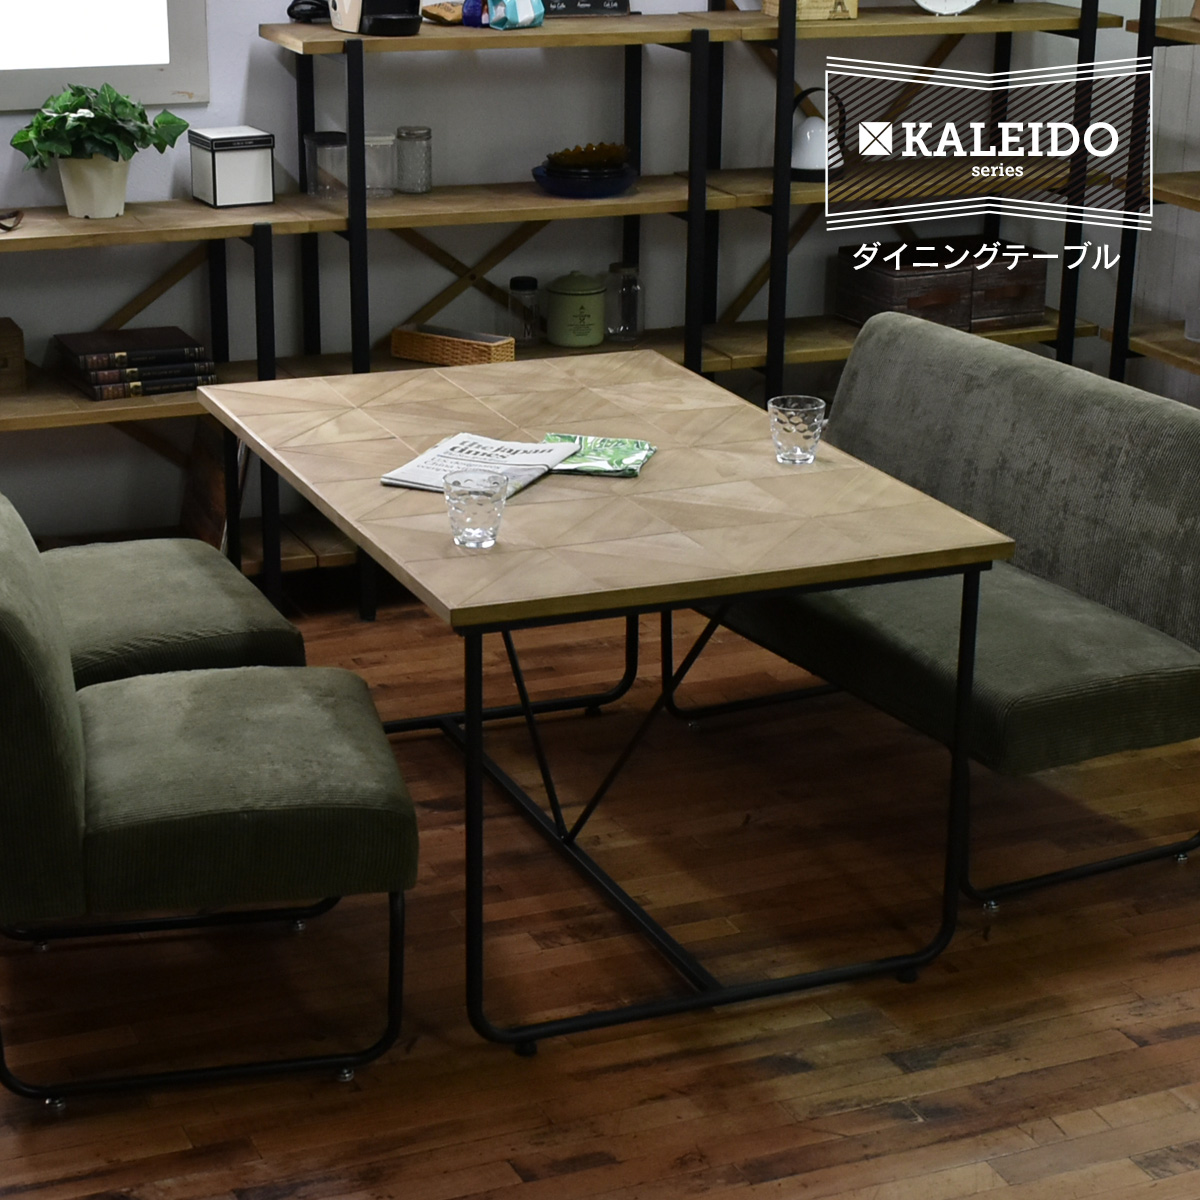 KALEIDO カレイド ダイニングテーブル 幅123 KADT-123 古材風 無骨 アイアン